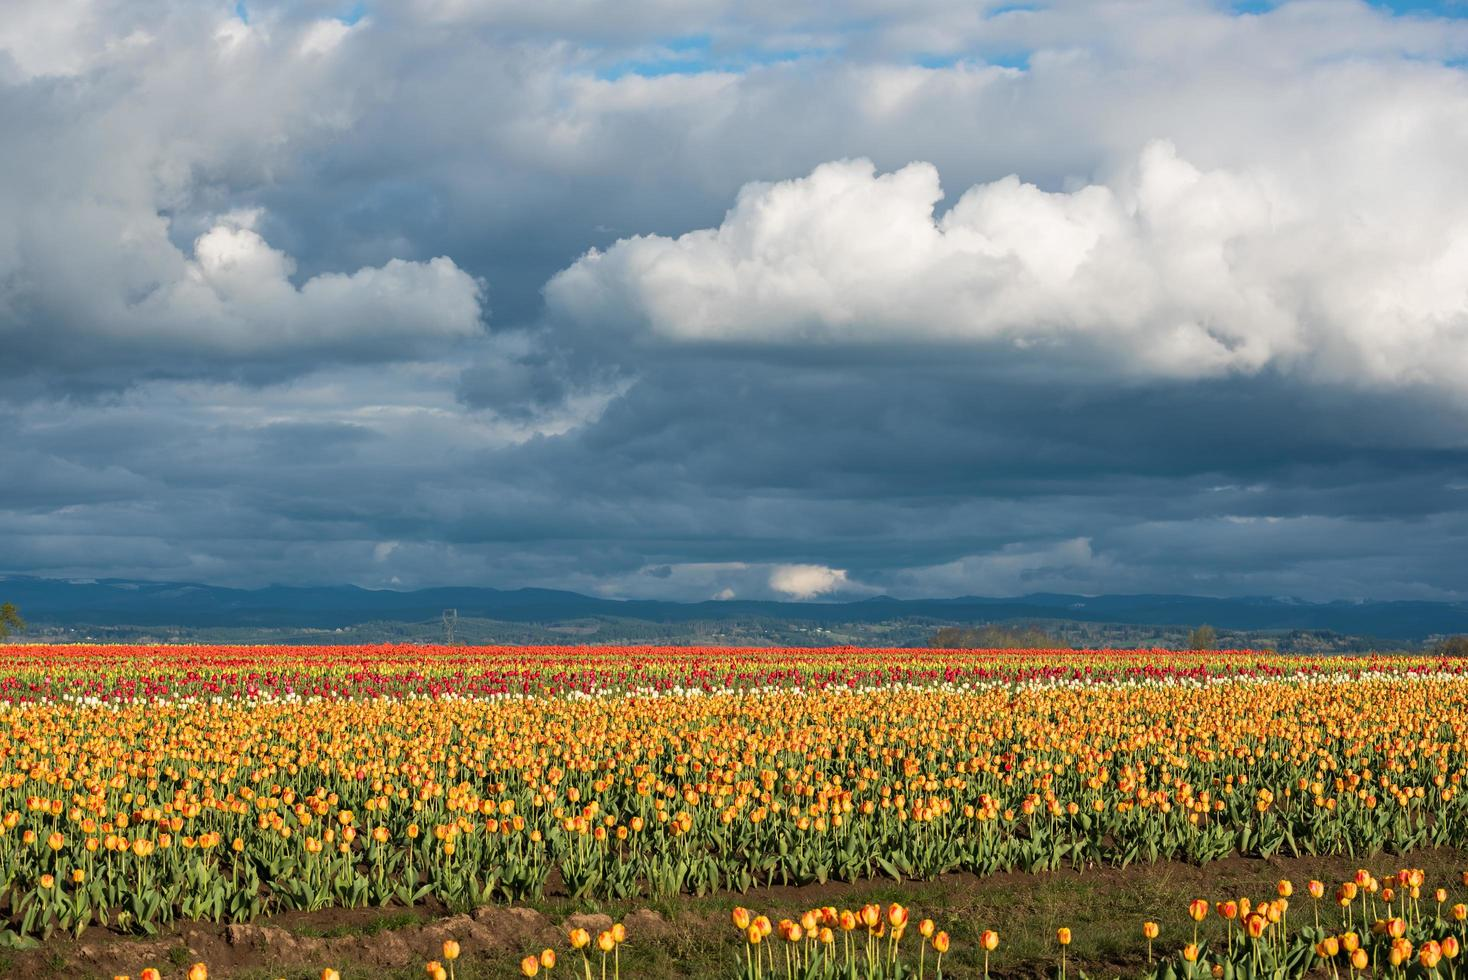 Clouds over a tulip field photo